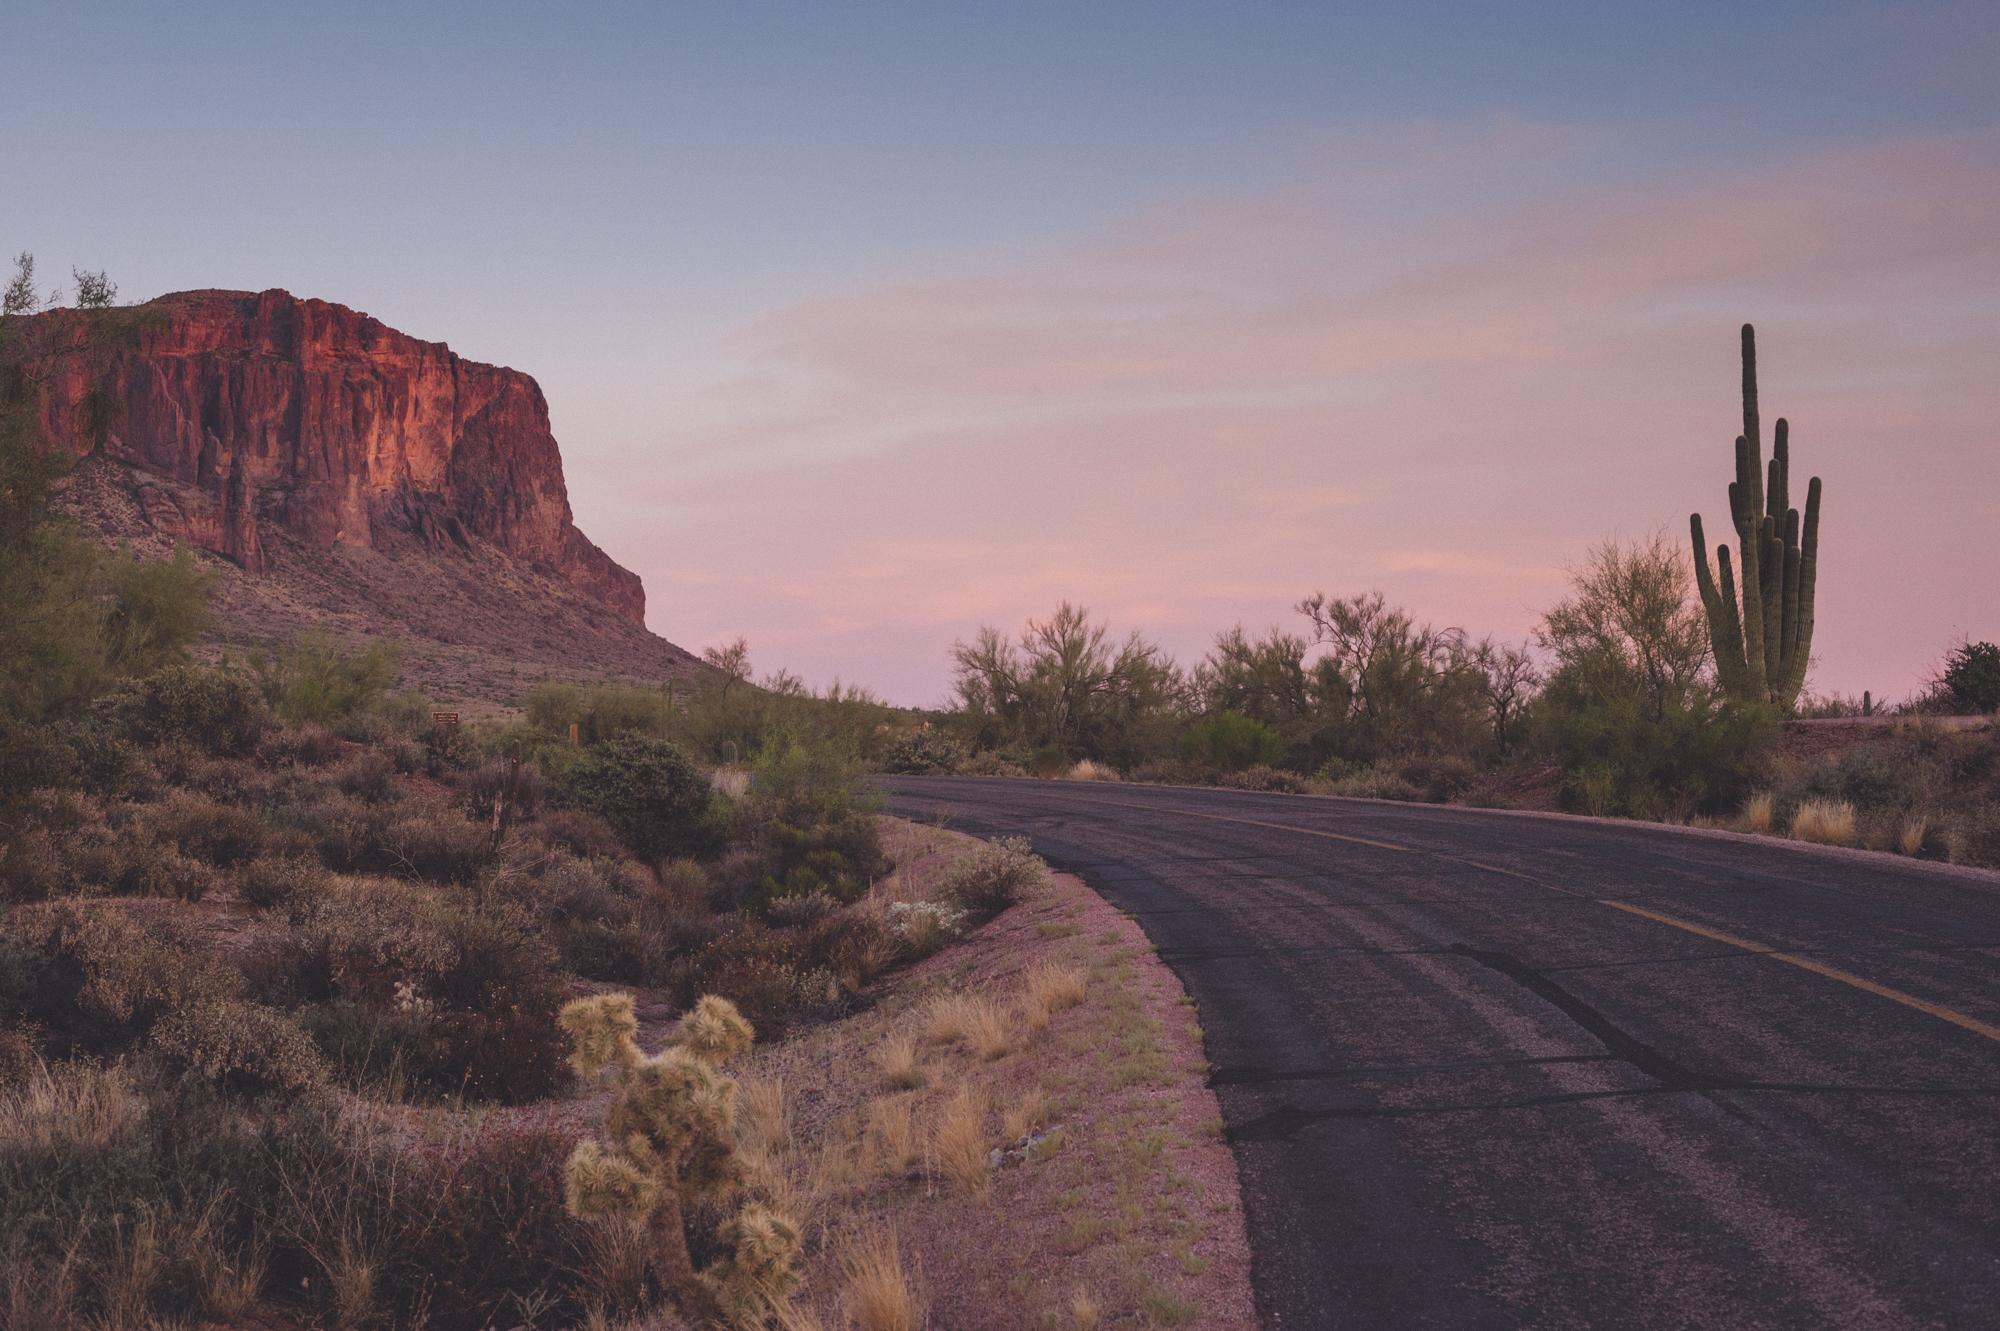 KC_Lifestyle_Photographer_Visiting_Arizona_Sedona_3449.jpg